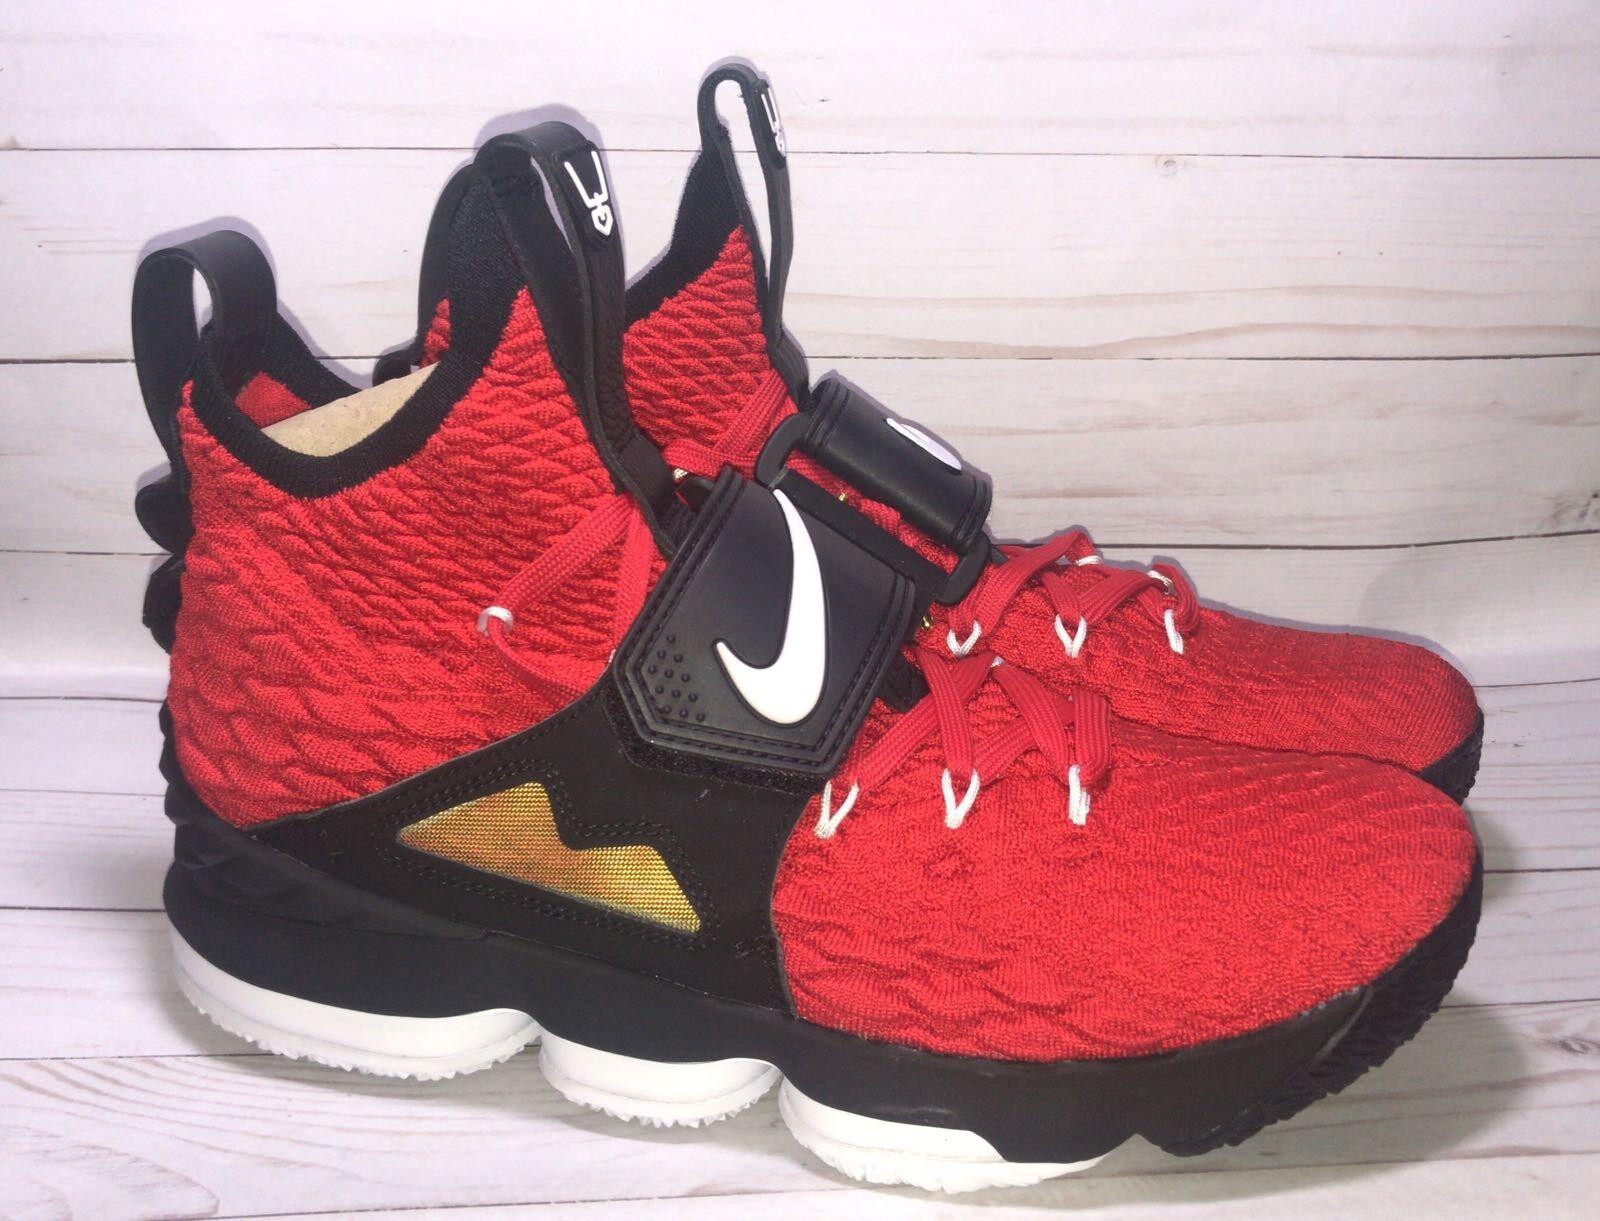 Nike lebron 15 xv prime ROT diamond revier größe 10 ao9144-600 james johnson